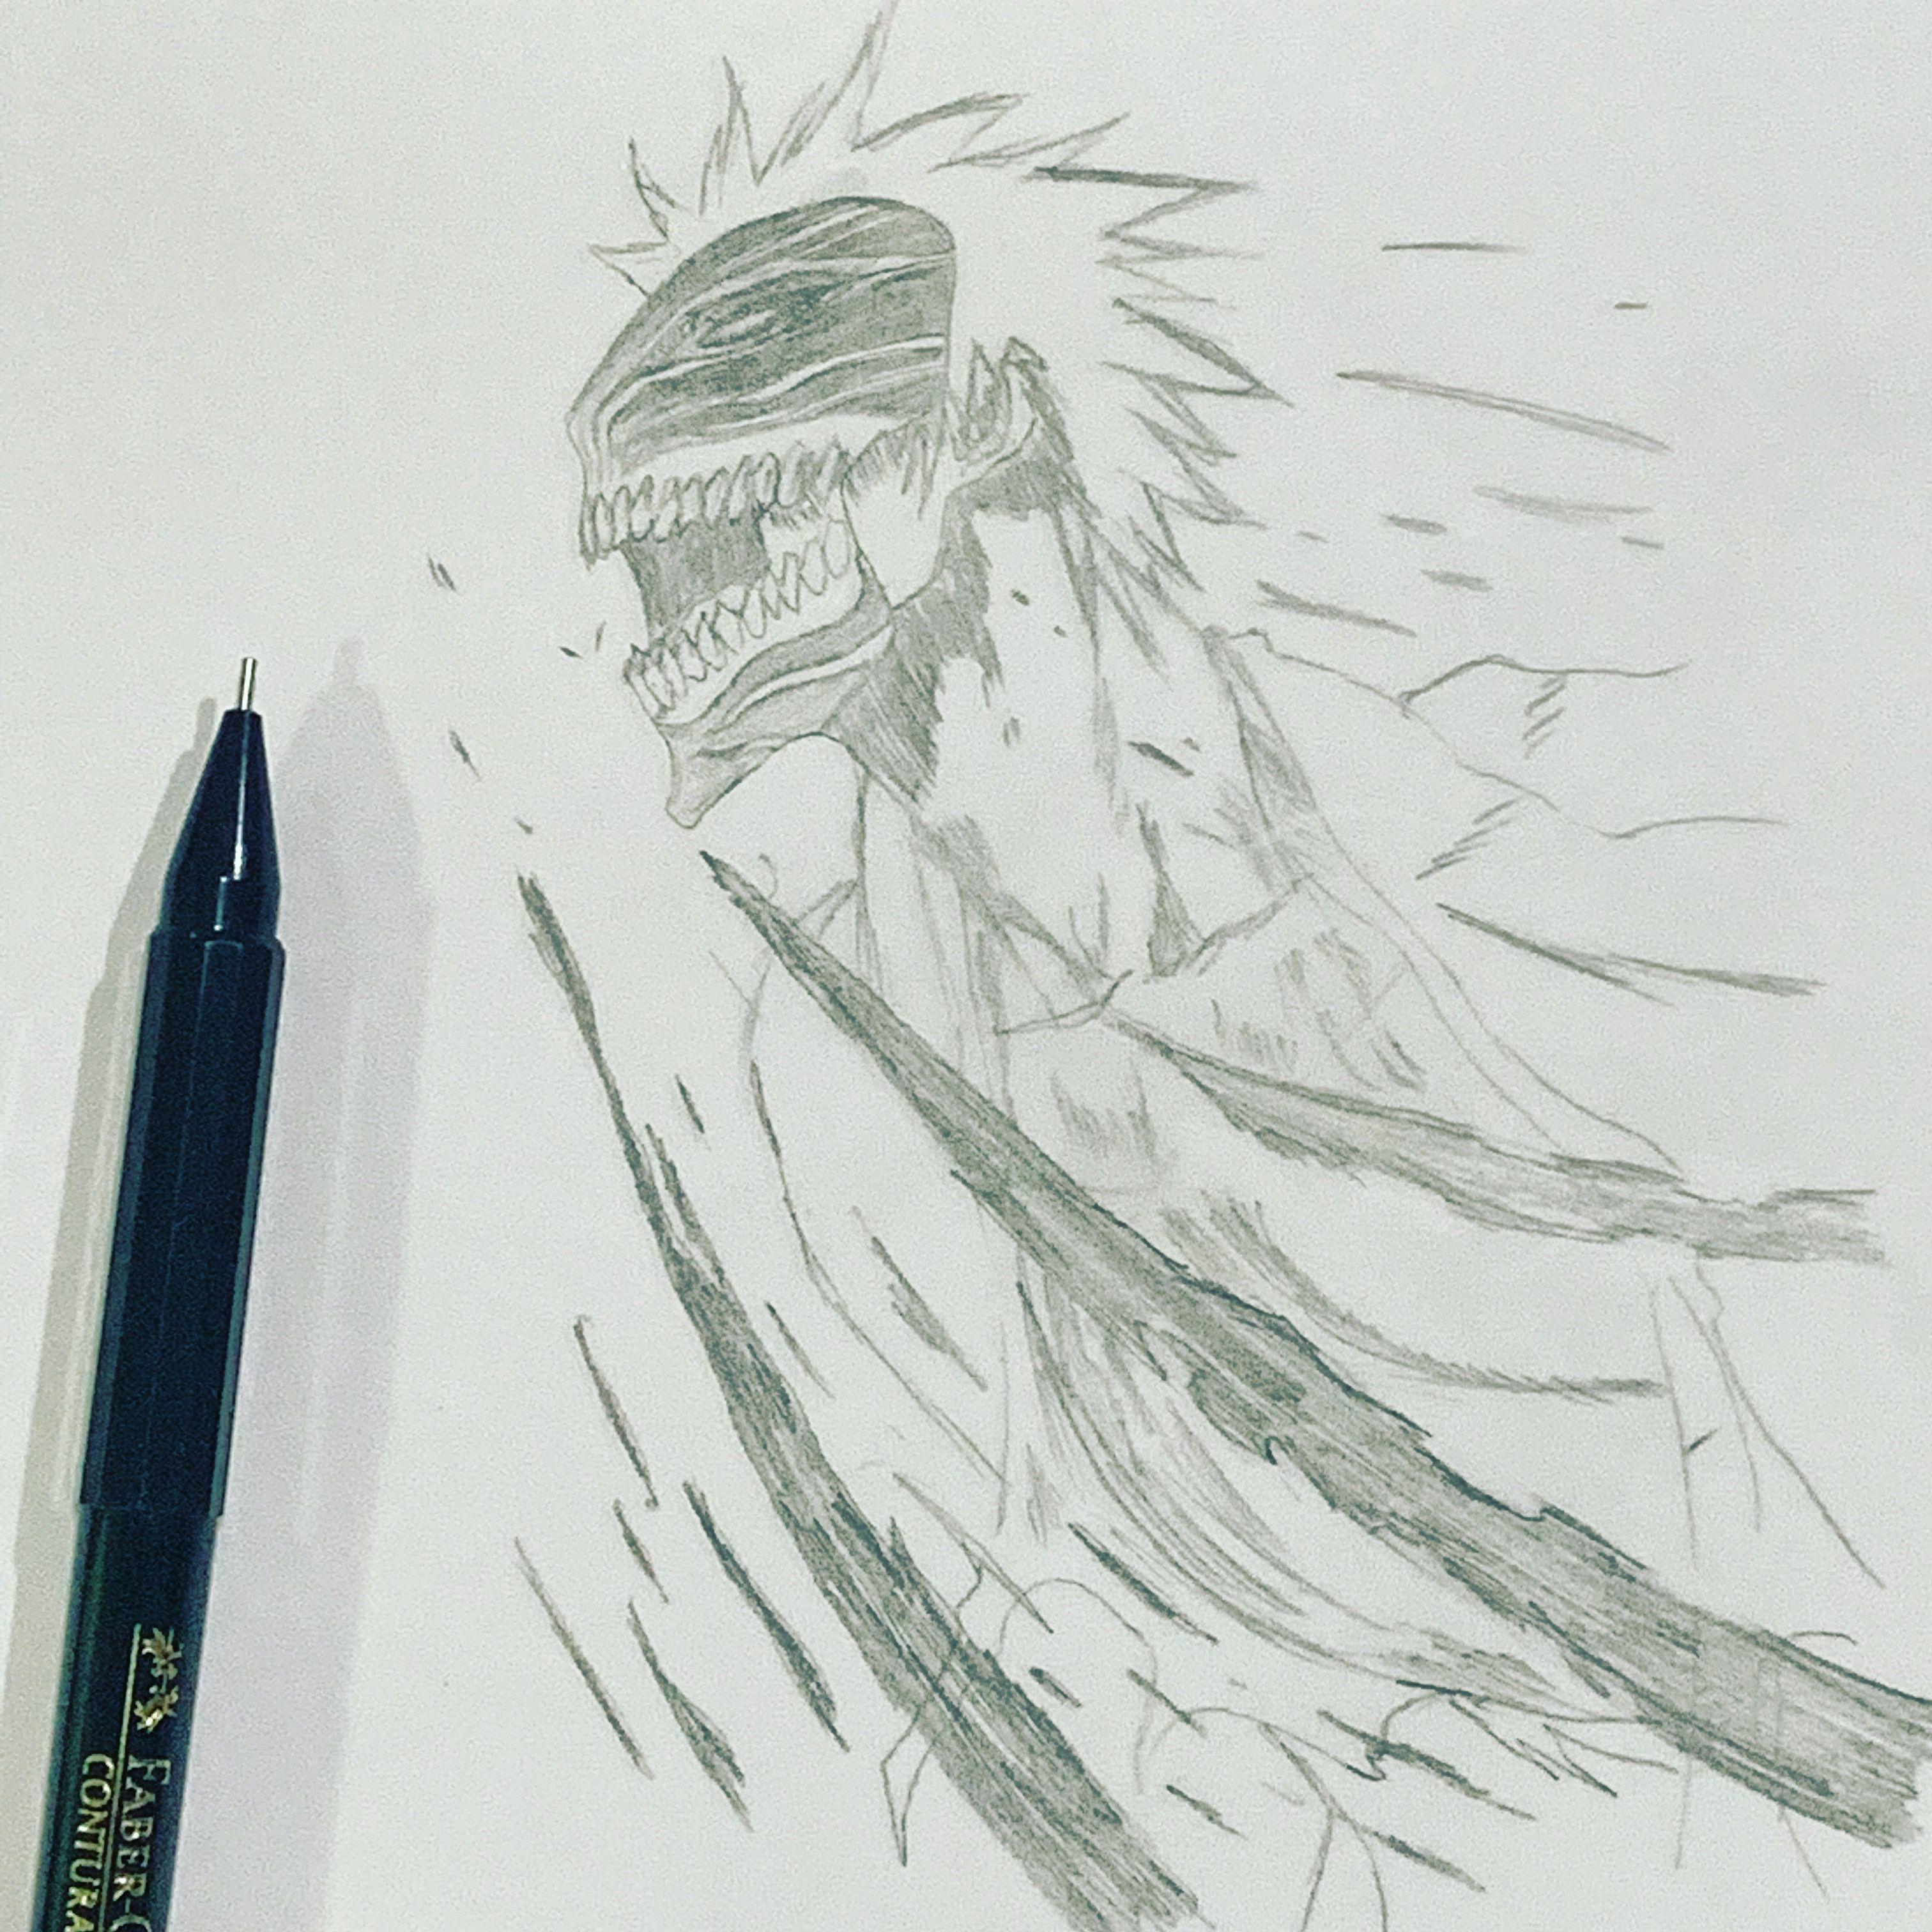 Ichigo Kurosaki From Bleach Anime Drawing Pencil Bleach Drawing Bleach Anime Drawings [ 3024 x 3024 Pixel ]